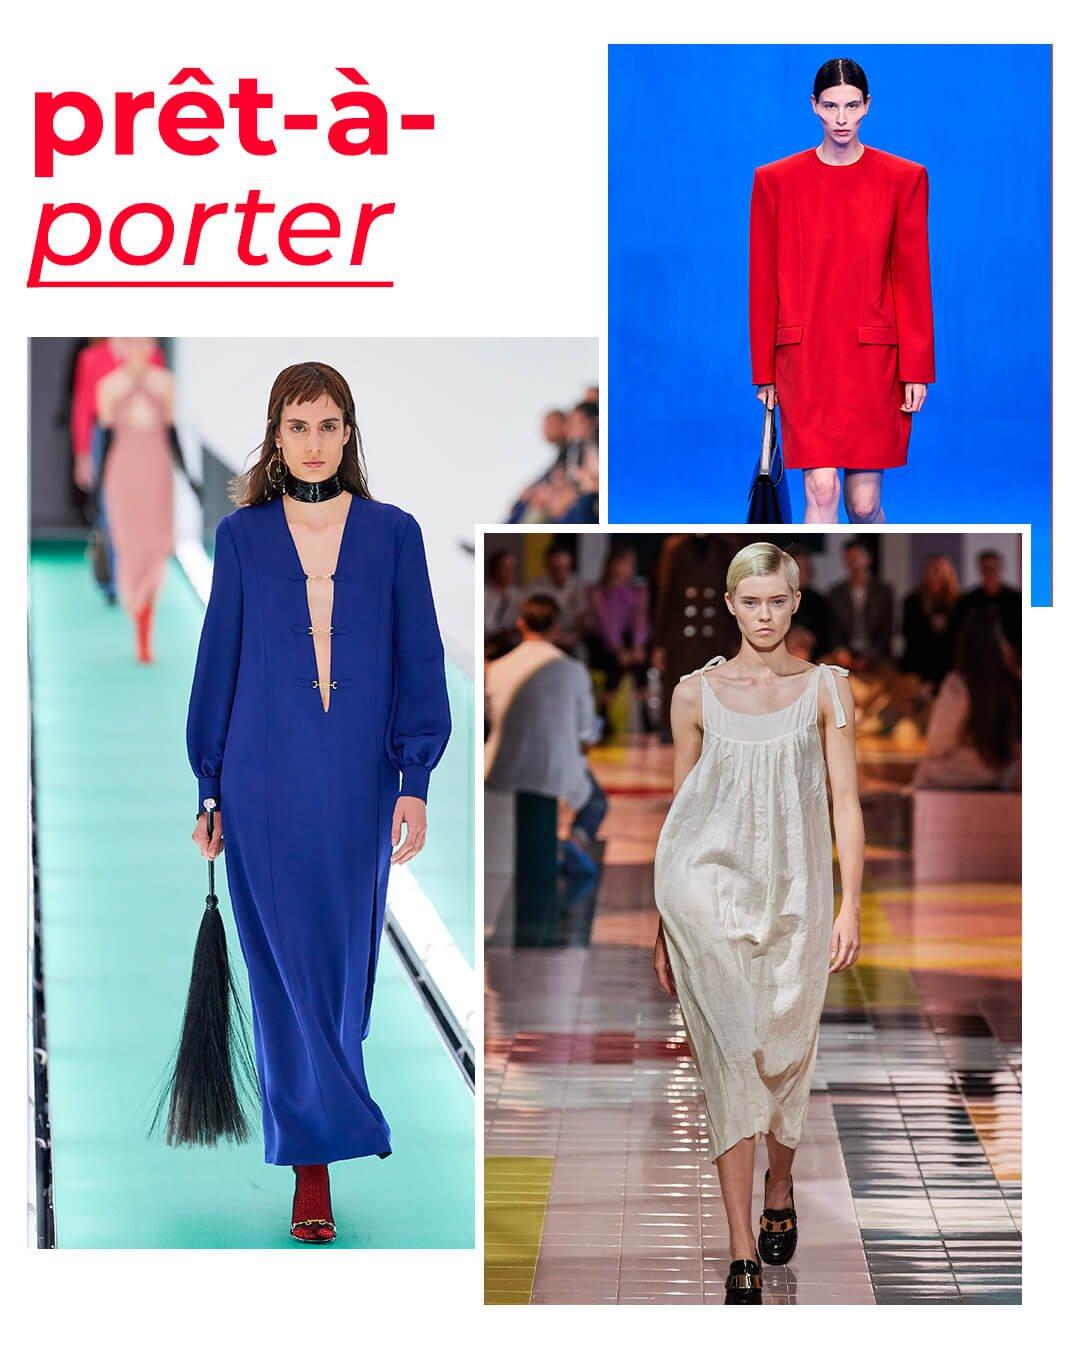 It girls - Pret-a-porter - Pret-a-porter - Verão - Runaway - https://stealthelook.com.br